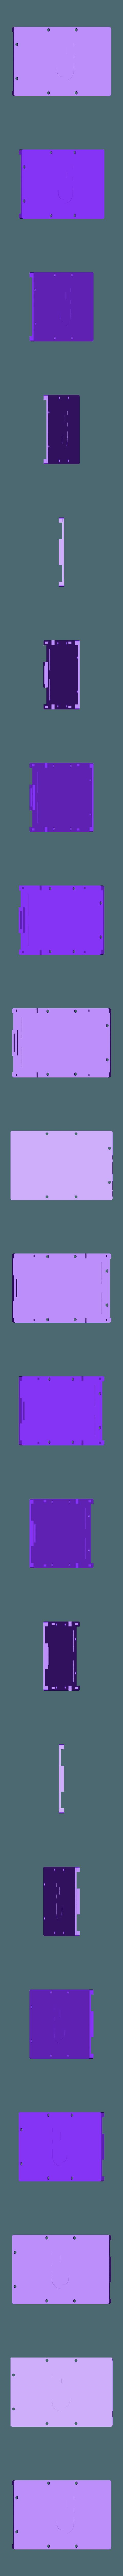 HDS 2.STL Download STL file NEW - Hard Drive SKYSCRAPER • 3D printer template, salva65